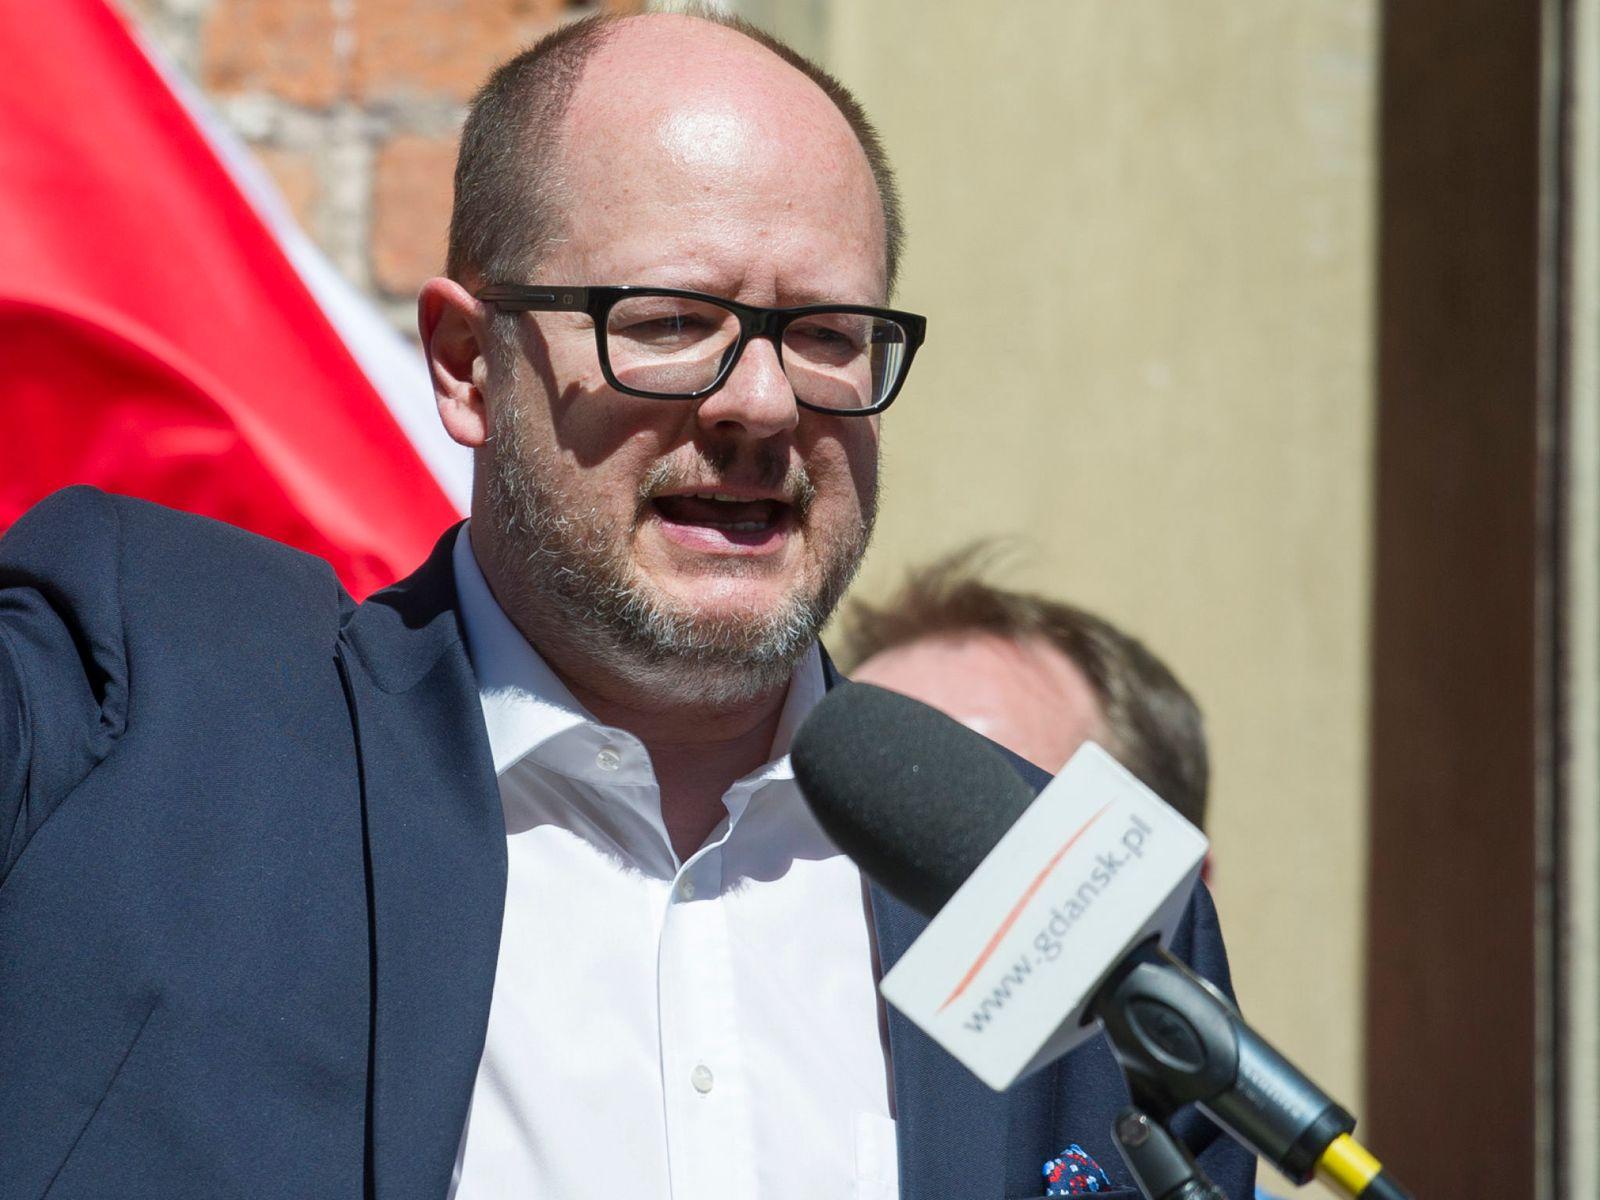 skynews-pawel-adamowicz-mayor-of-gdansk_4545449.jpg